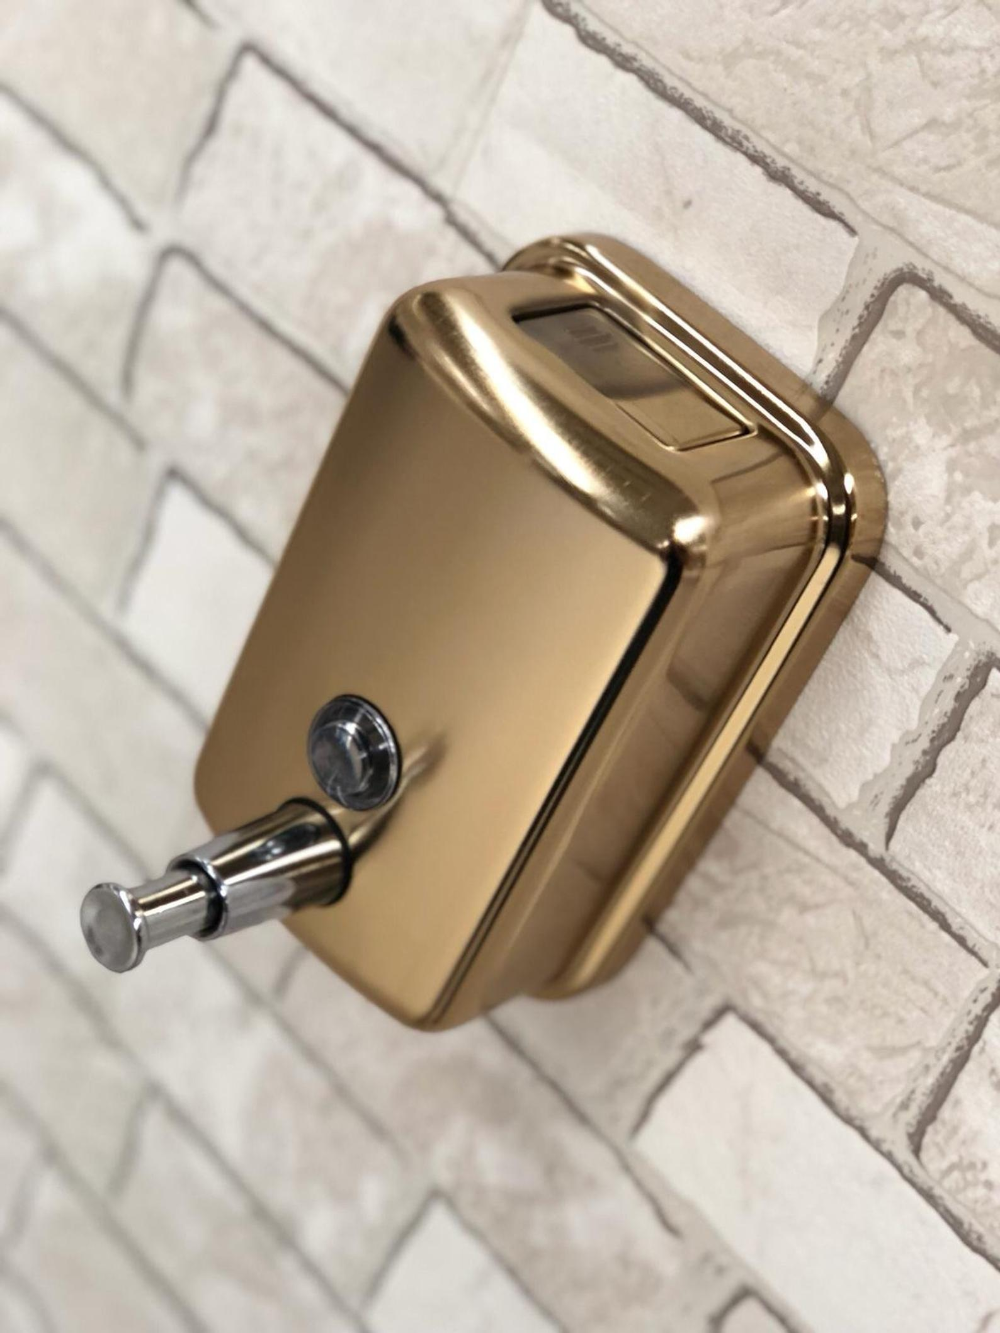 Commercial Soap Dispenser Manuel Wall Mount Liquid Soap Lotion Dispenser Steel Brass Antique Mirror Gift In 2020 Wall Mounted Soap Dispenser Antique Mirror Lotion Dispenser